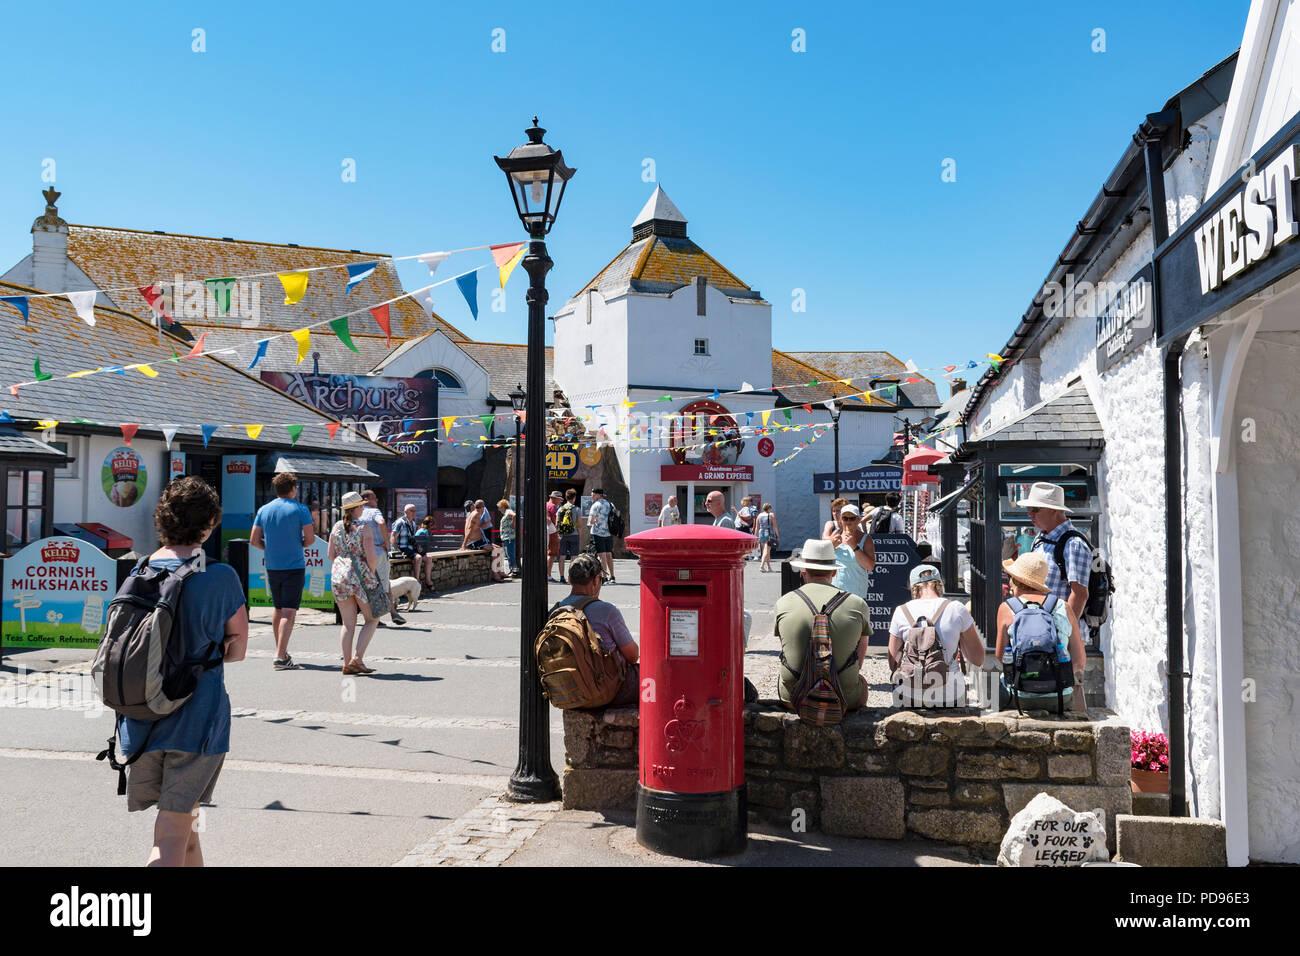 Lands End atracción turística en Cornwall, Inglaterra, Gran Bretaña, Reino Unido. Foto de stock